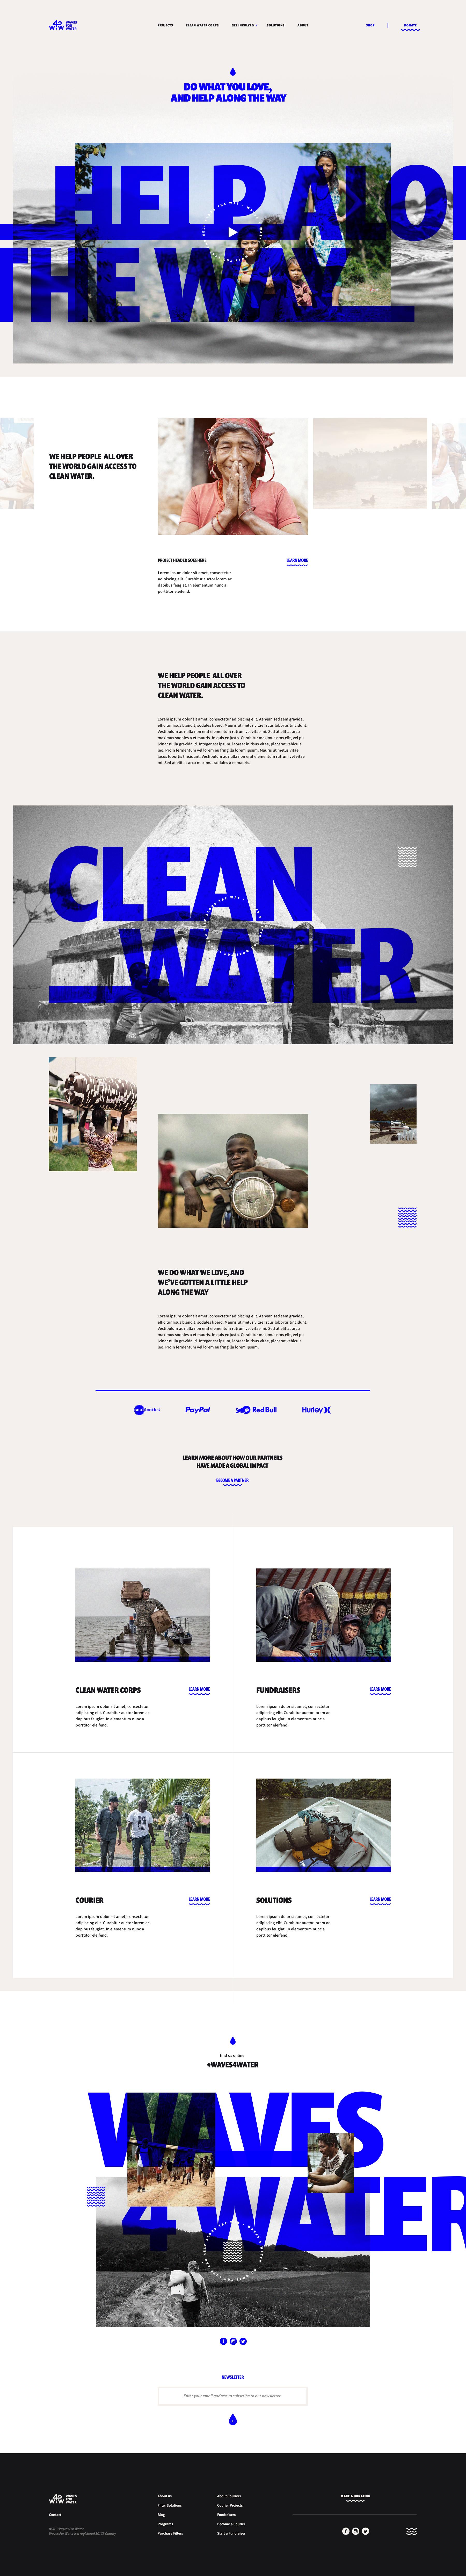 Non-Profit Website Example #1